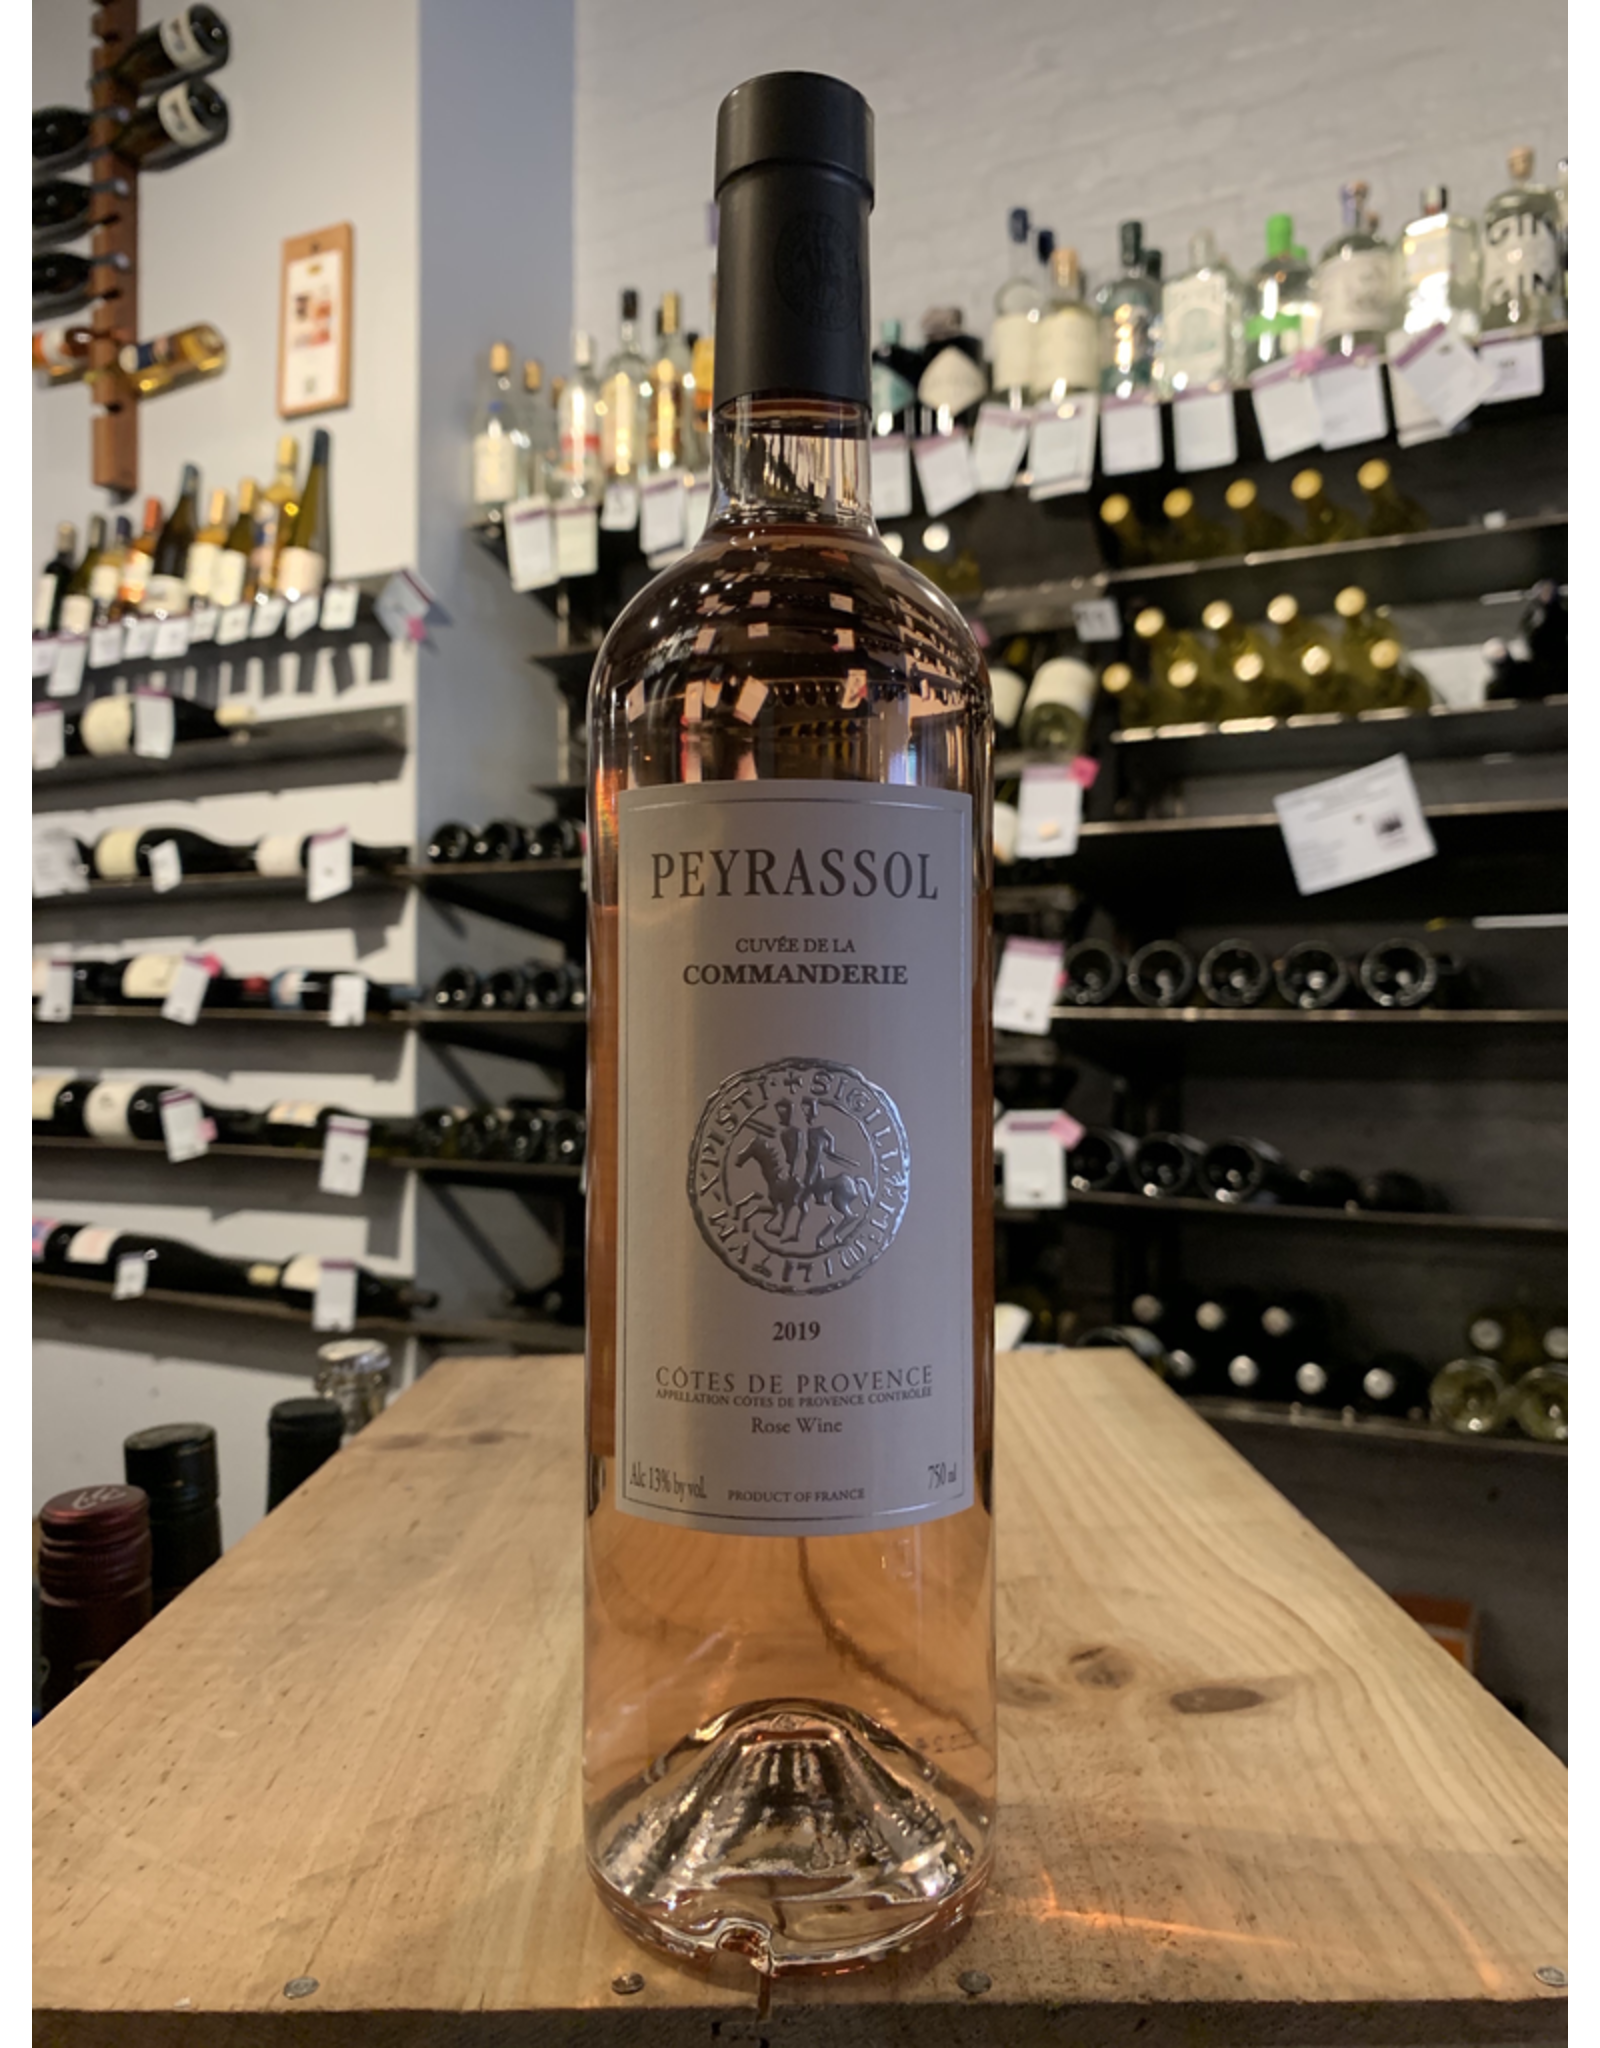 2019 Commanderie de Peyrassol Rose - Cotes de Provence, France